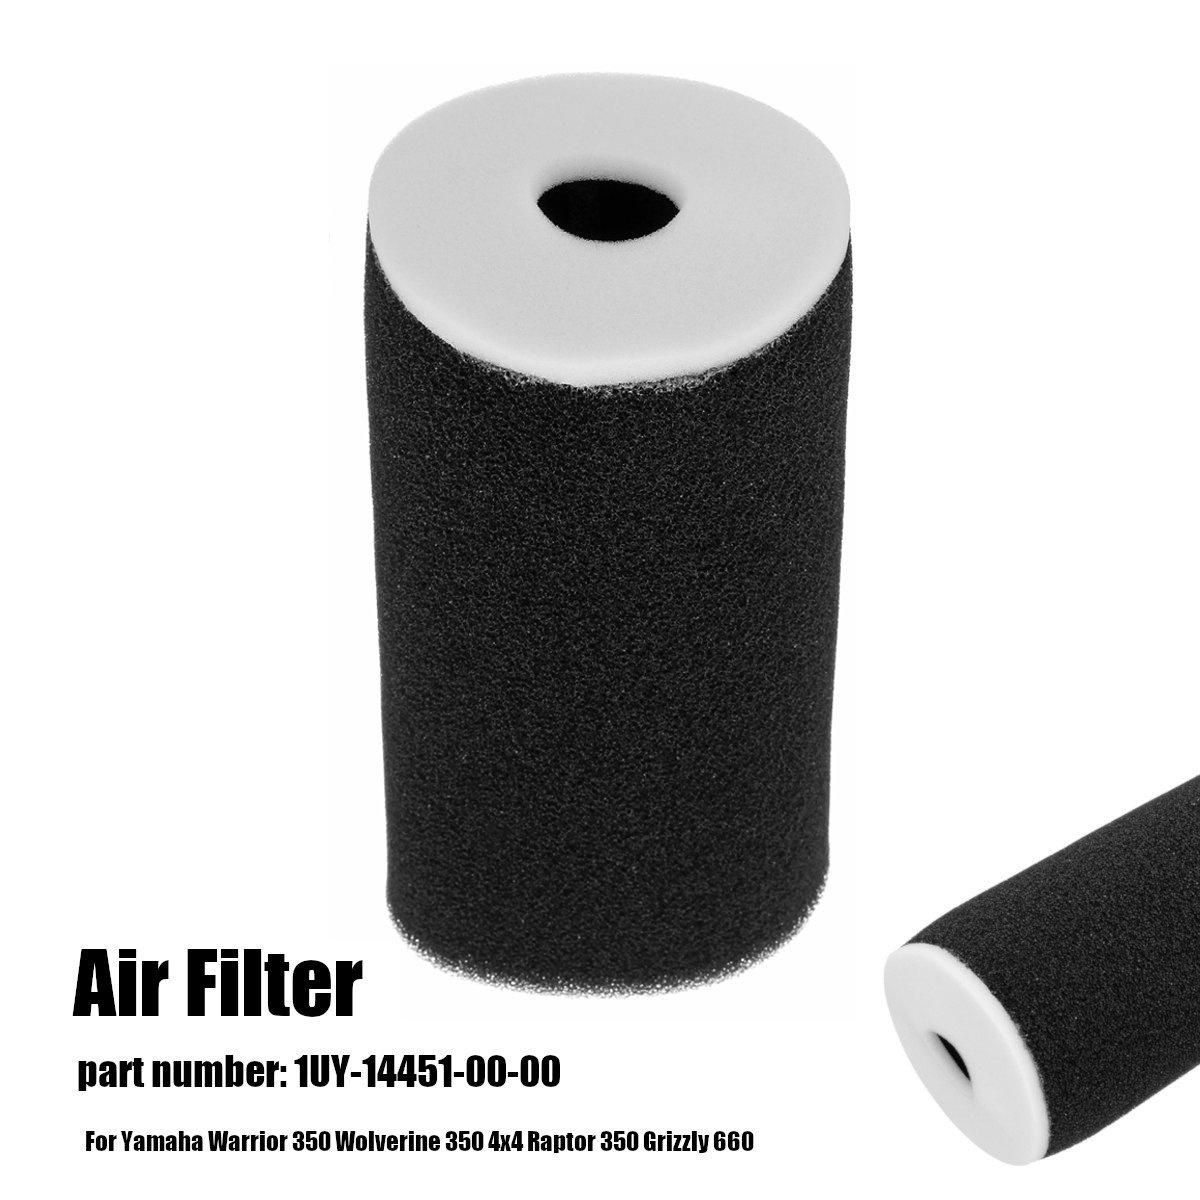 OEM Yamaha Air Filter Cleaner  1UY-14451-00-00 Warrior YFM350 Raptor Grizzly